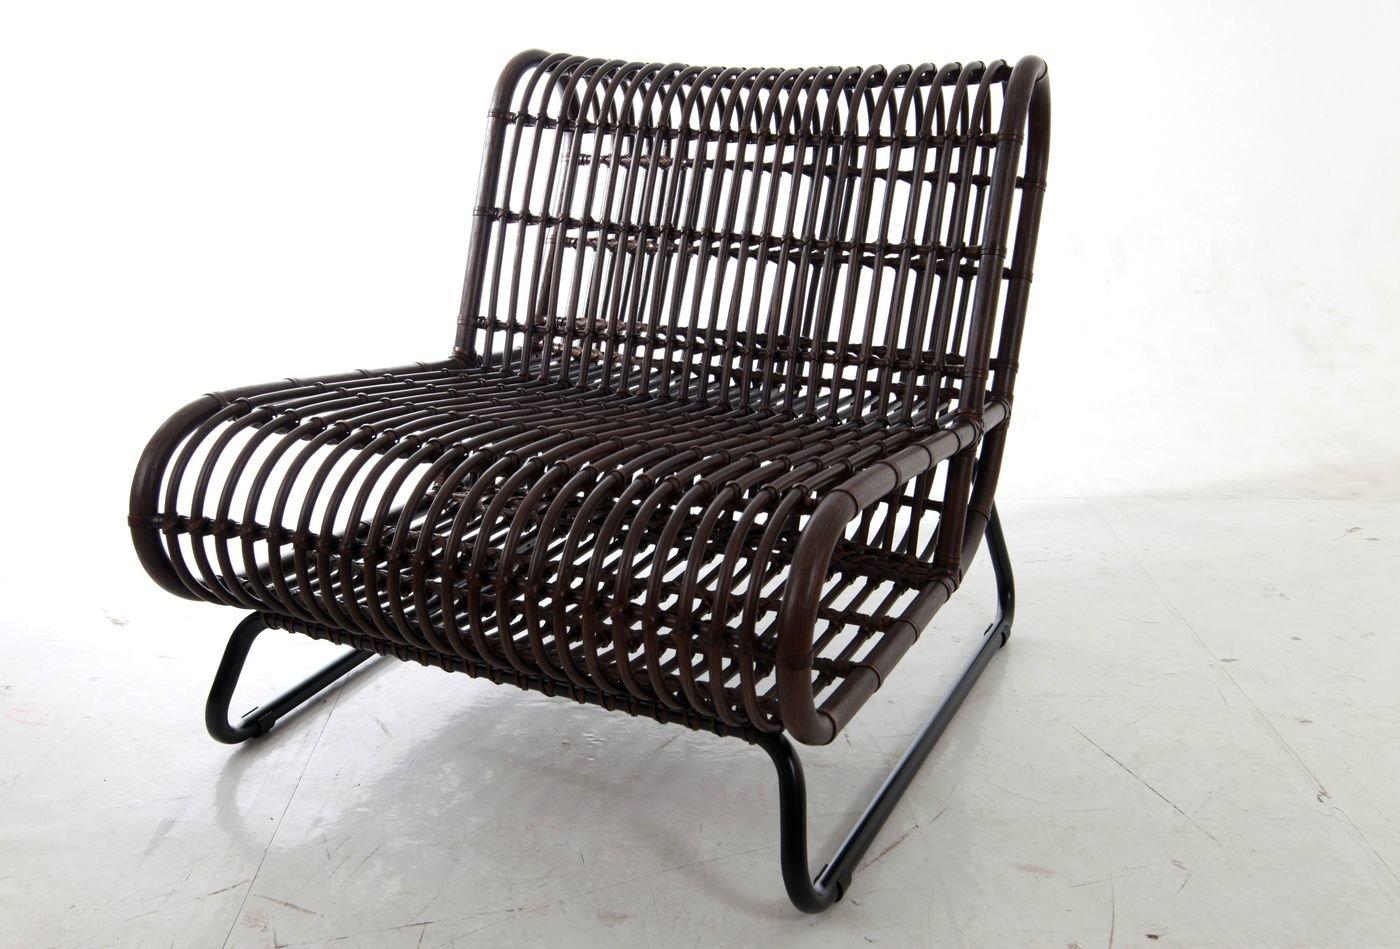 Pleasing Loop Lounge Chair By Abie Abdillah At Coroflot Com Customarchery Wood Chair Design Ideas Customarcherynet